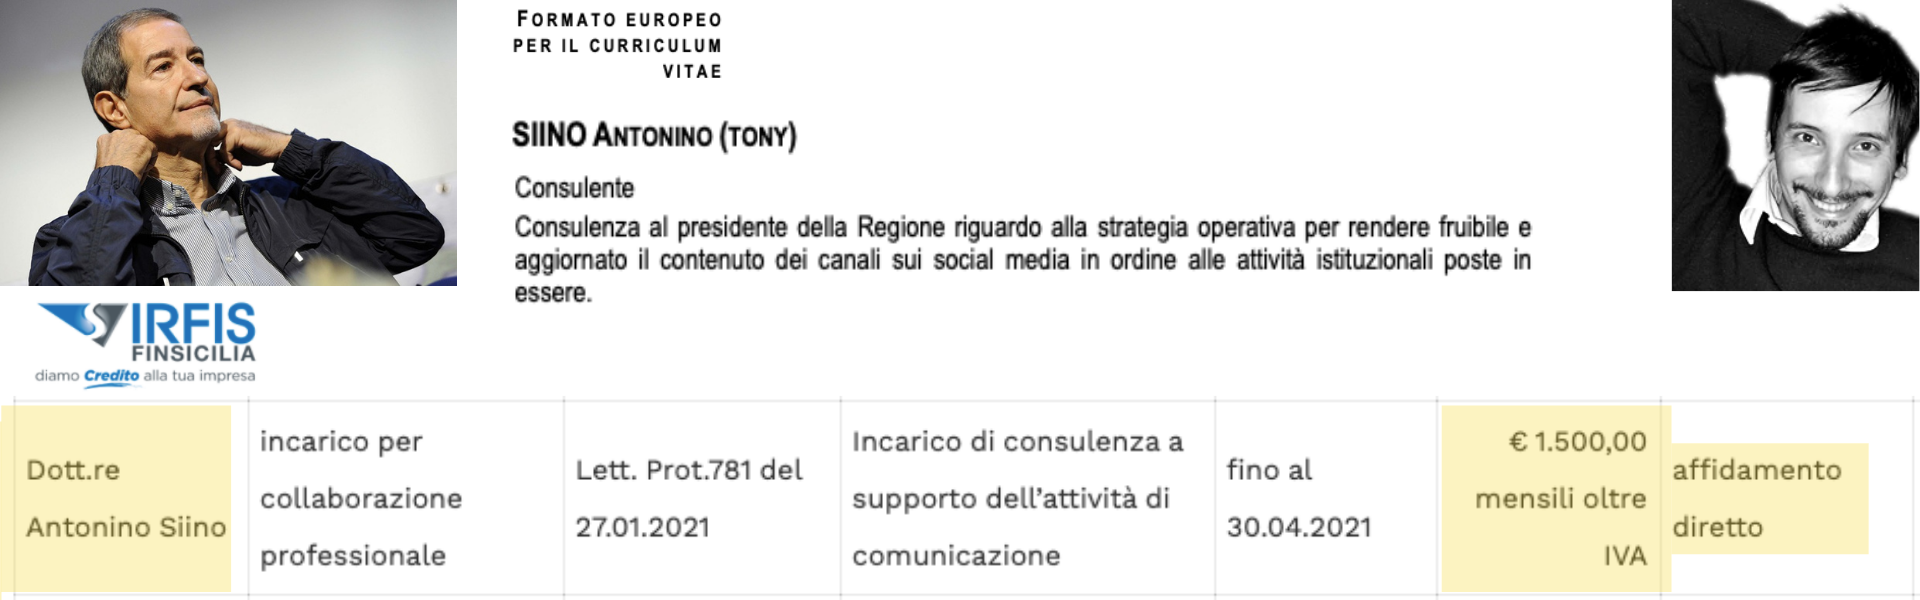 aperturasiino-1616994366.png